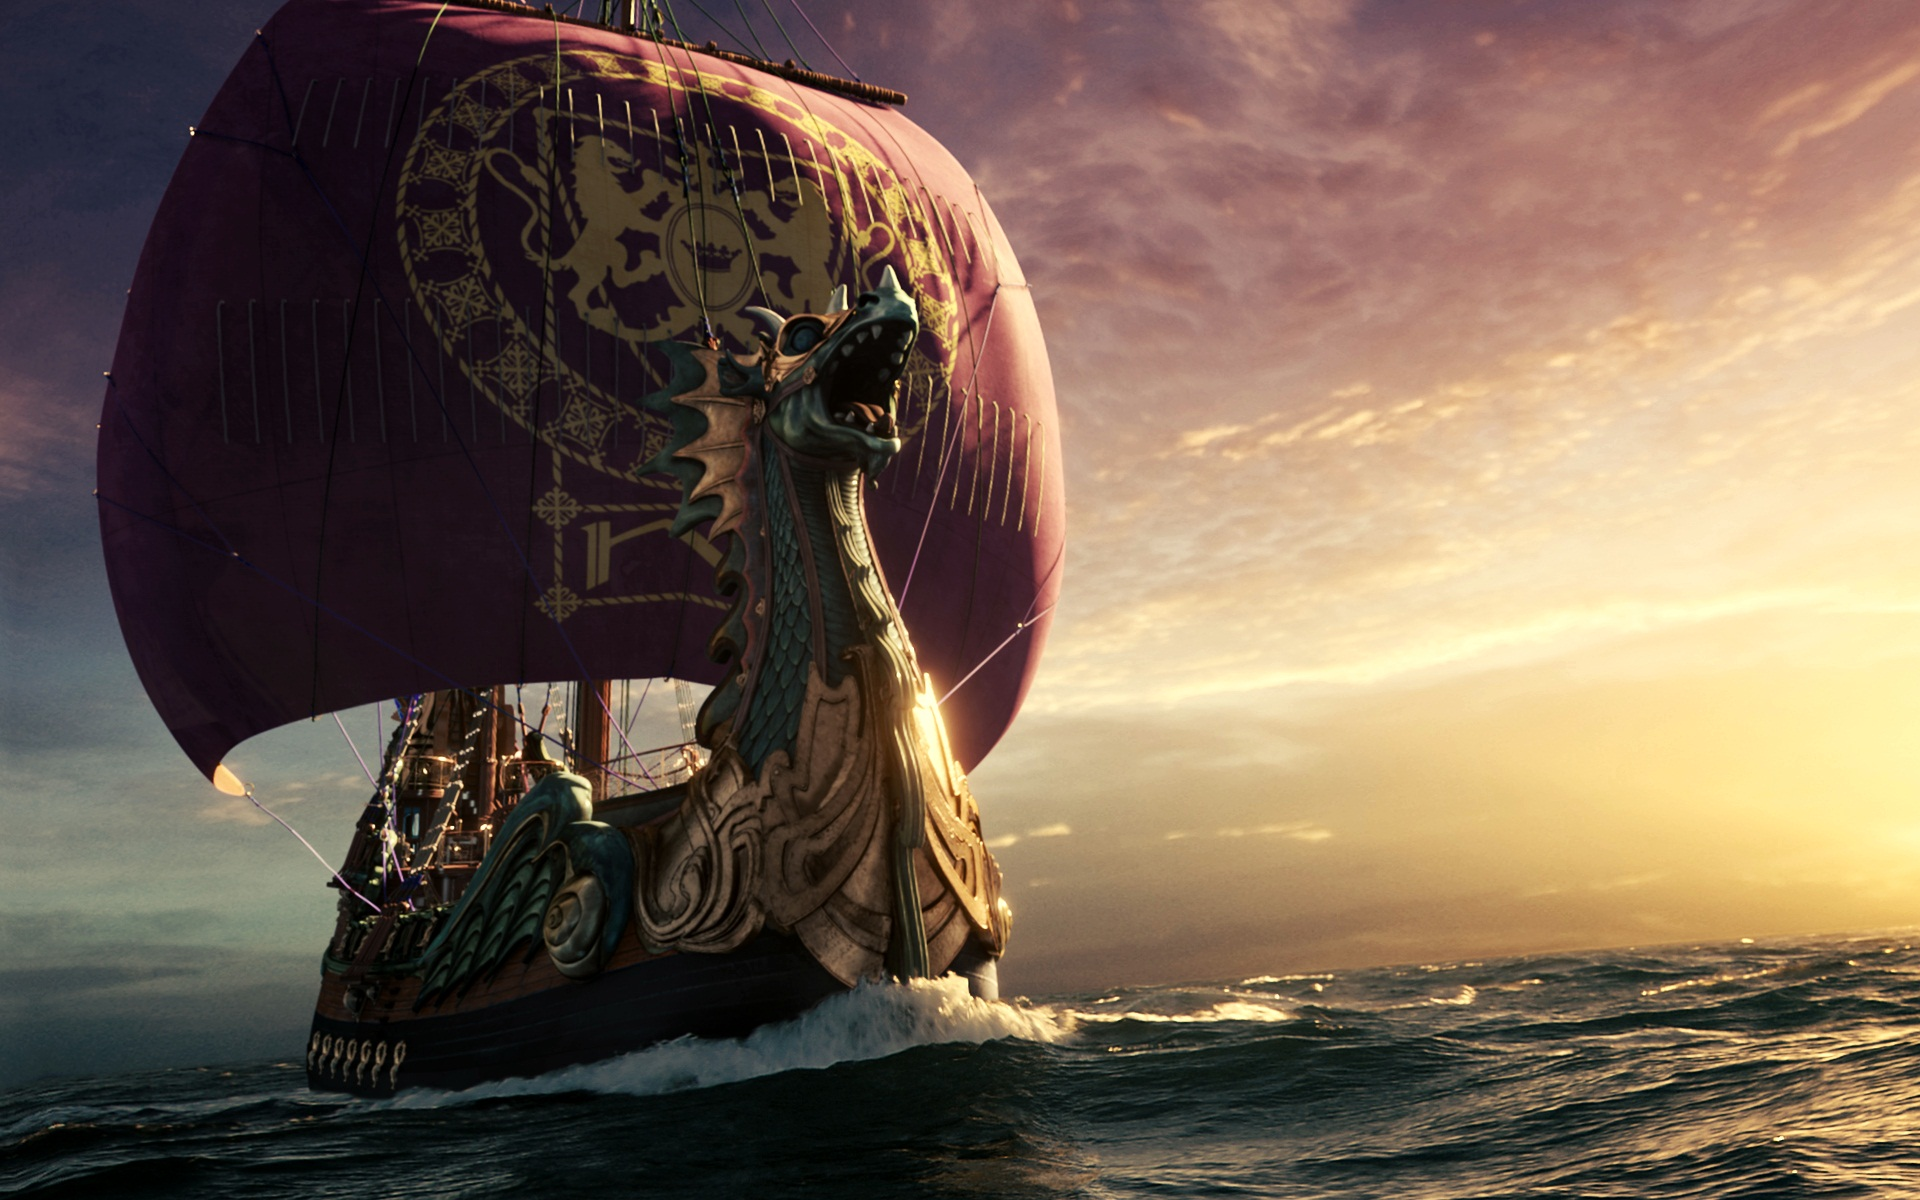 Narnia Dawn Treader Ship Wallpaper